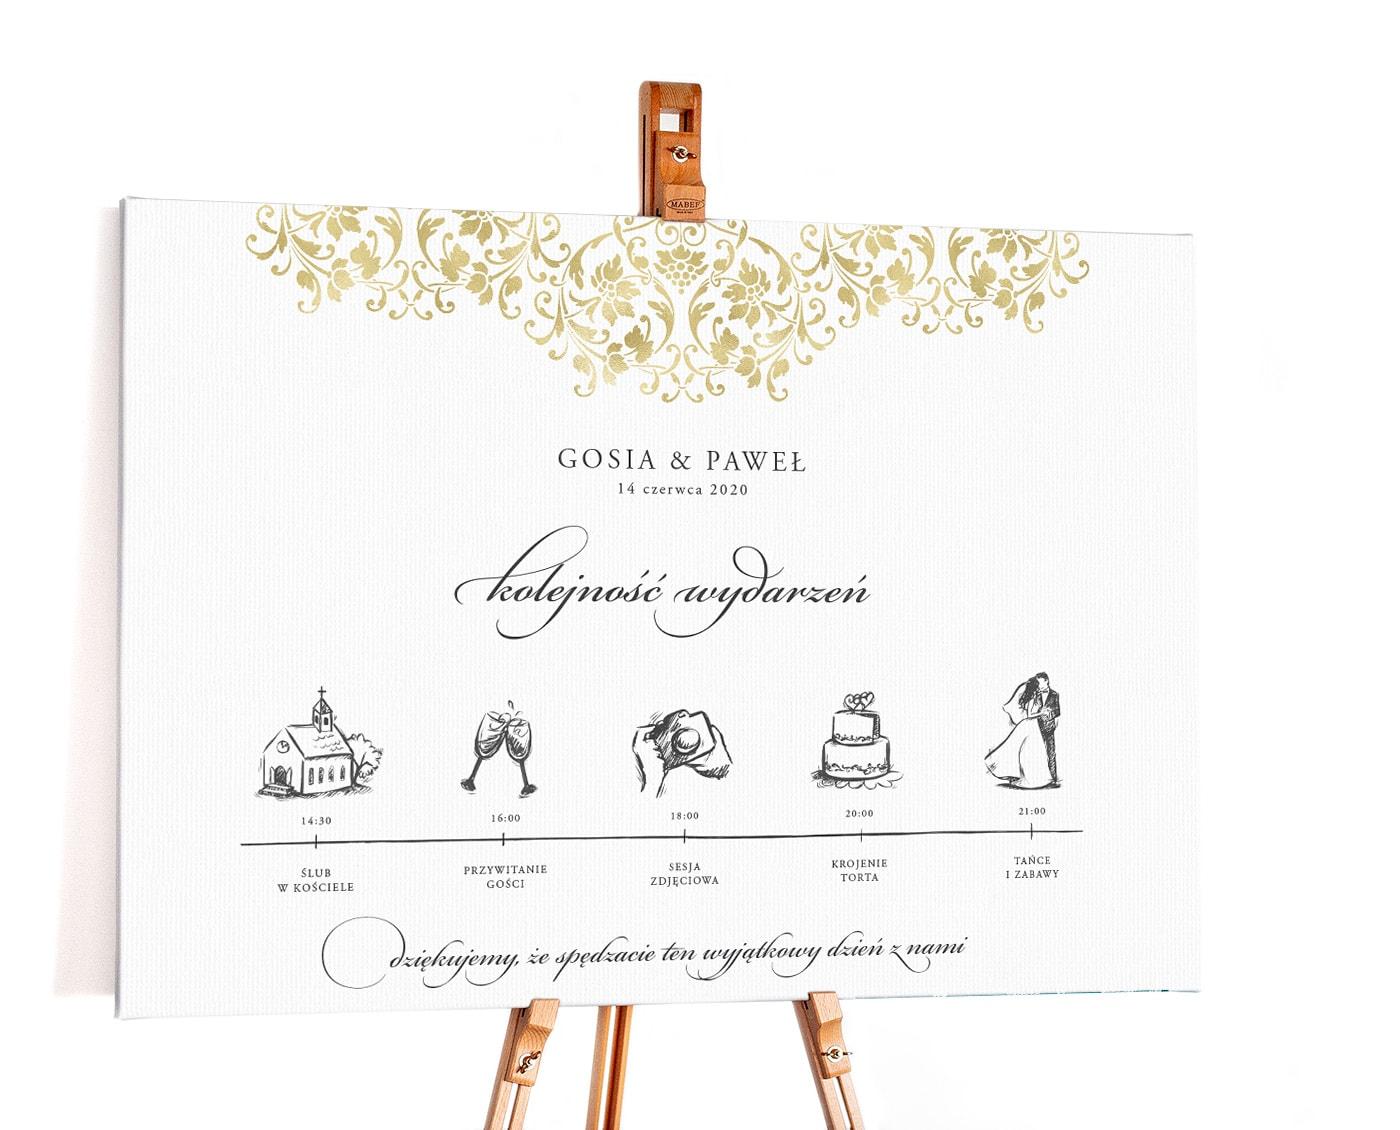 Plan ceremoni weselnej z eleganckimi ornamentami i pięknymi rysunkami